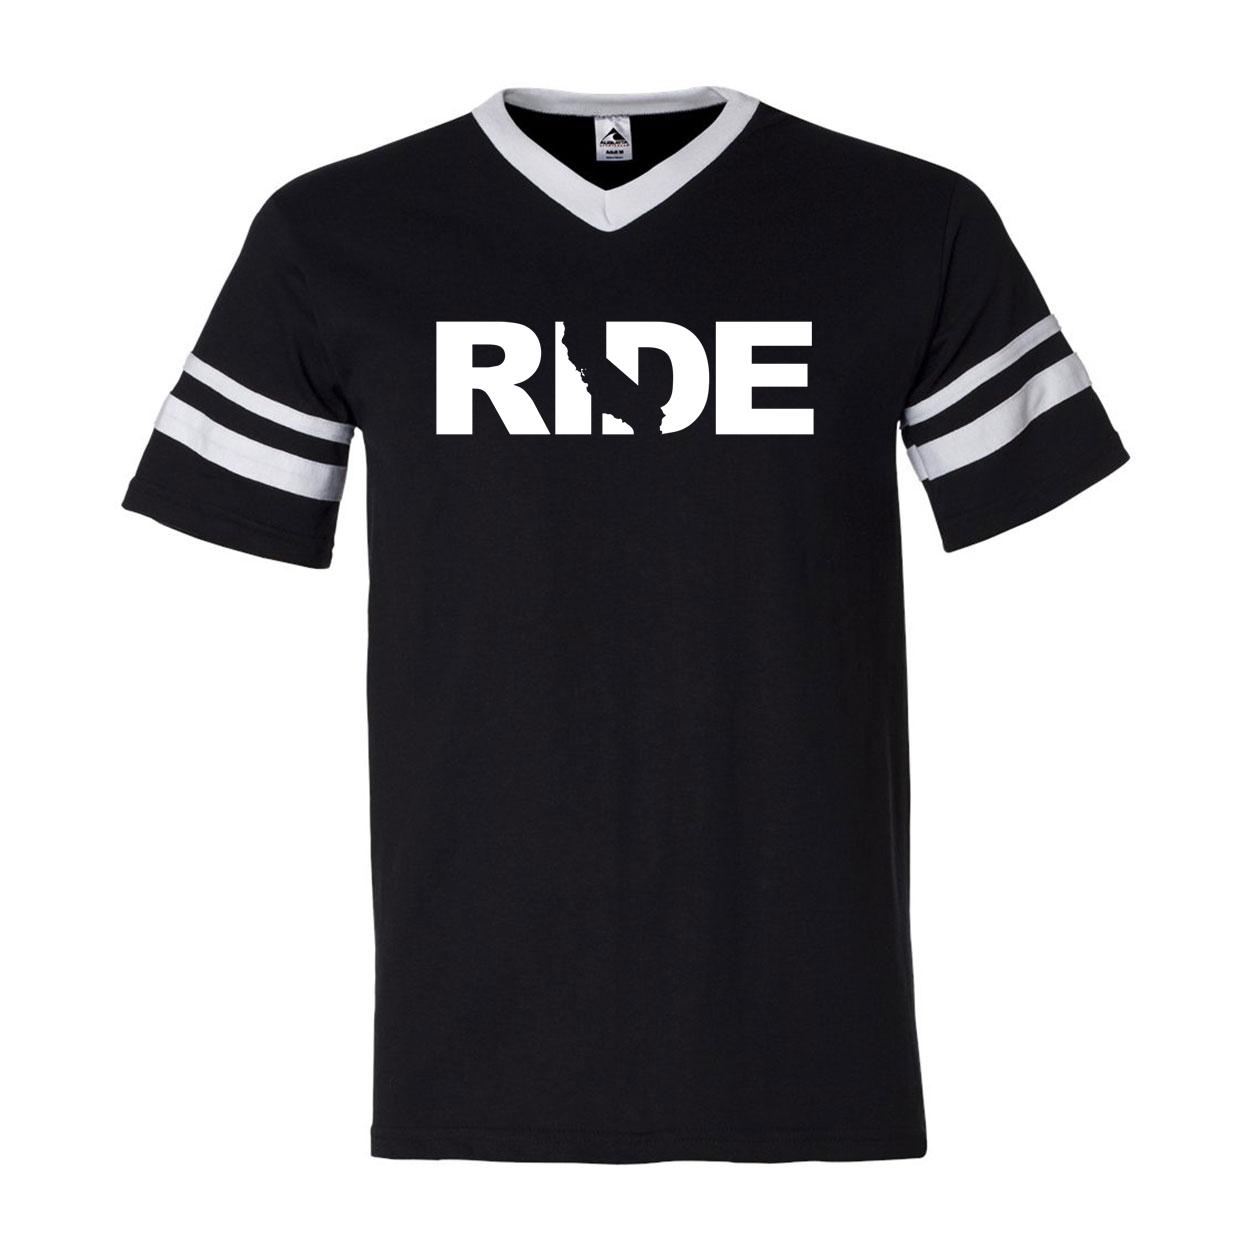 Ride California Classic Premium Striped Jersey T-Shirt Black/White (White Logo)